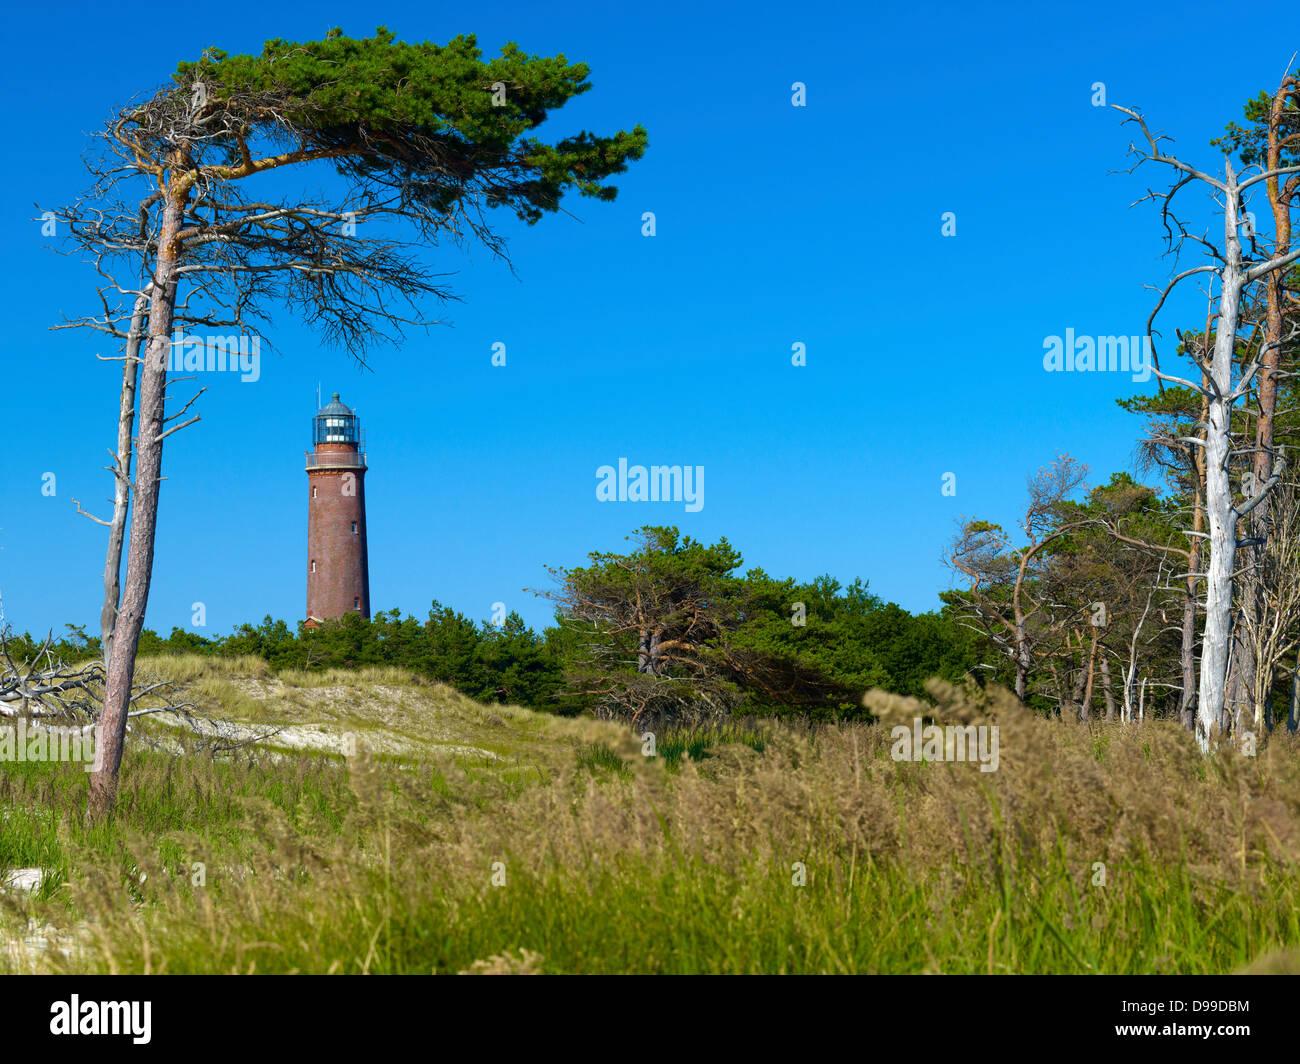 Lighthouse Darsser Ort, Prerow, Fischland-Darss-Zingst, Mecklenburg-Western Pomerania, Germany - Stock Image